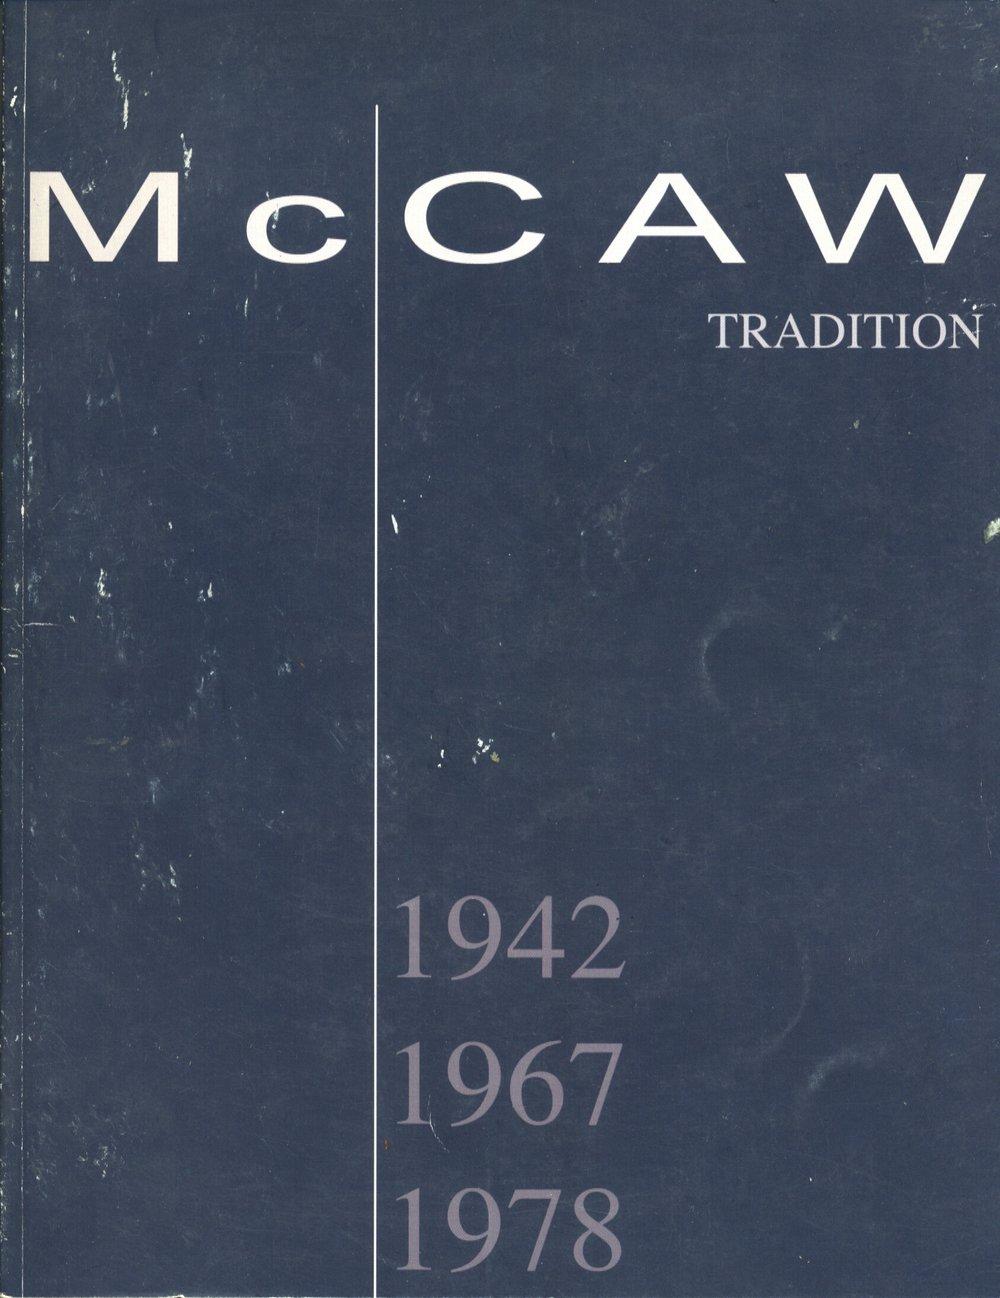 McCaw6a copy.jpg